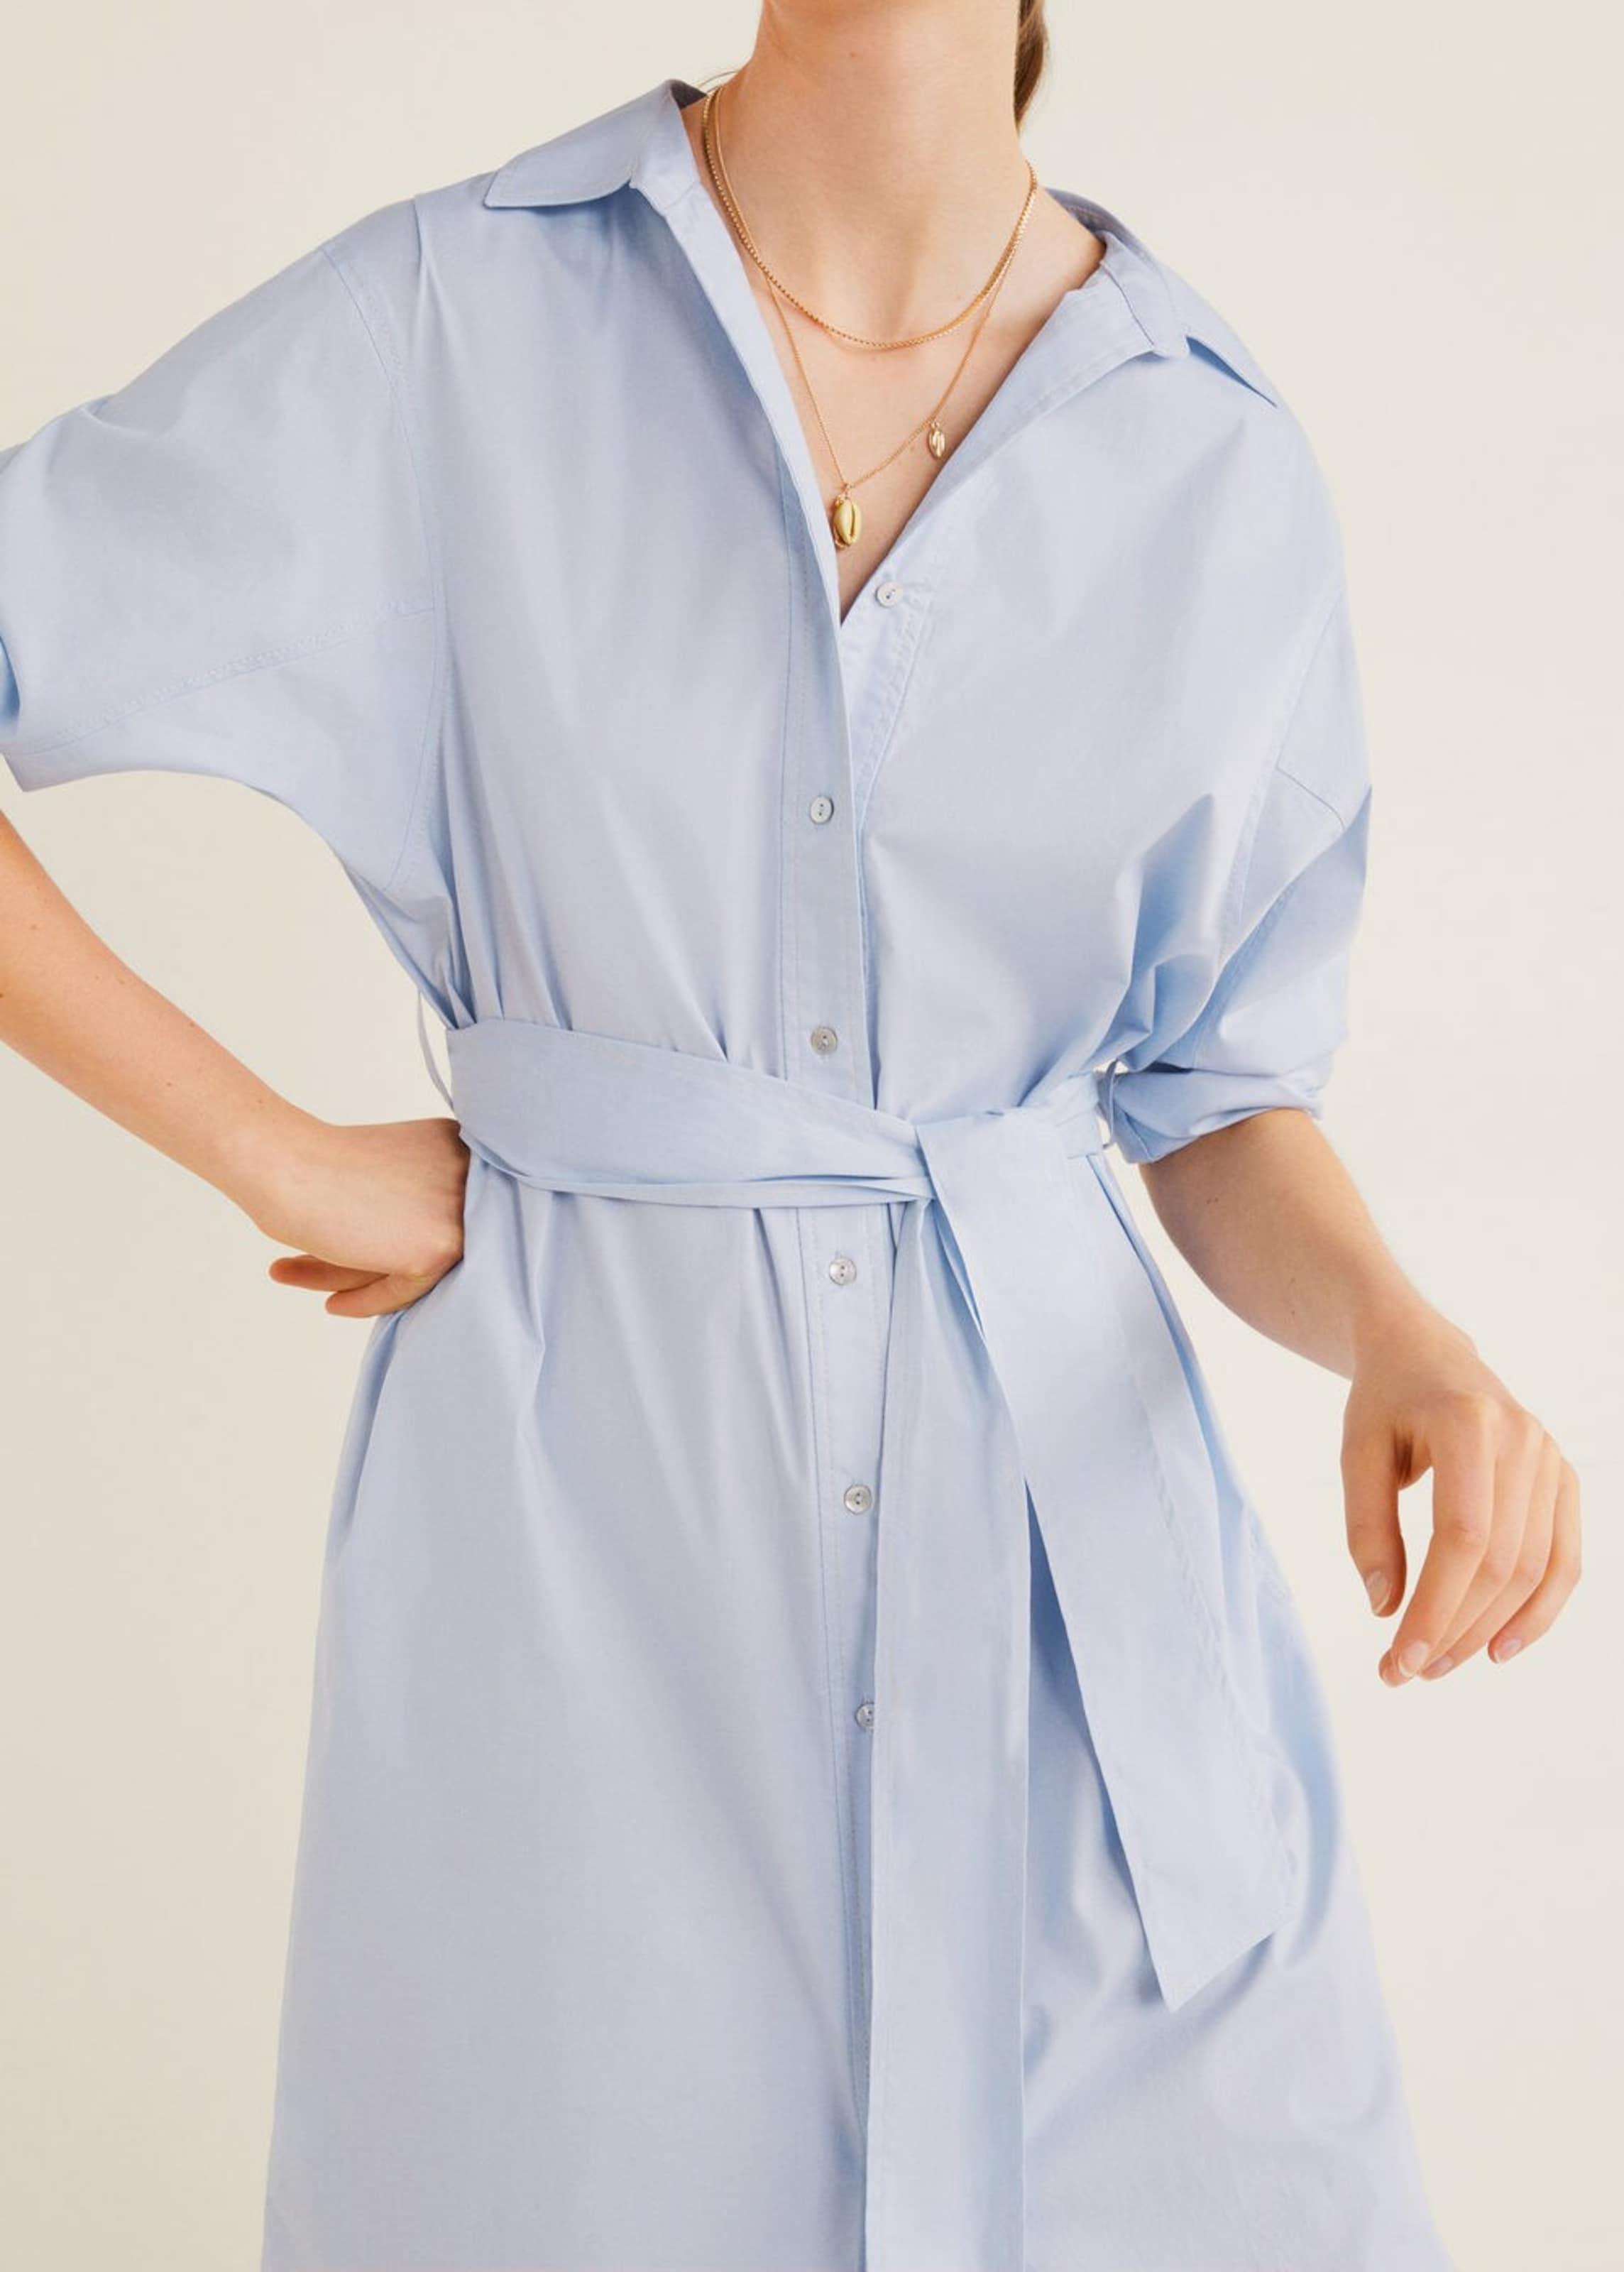 Pastellblau Kleid Kleid 'cuscus' Mango Mango In vmwPyN8n0O